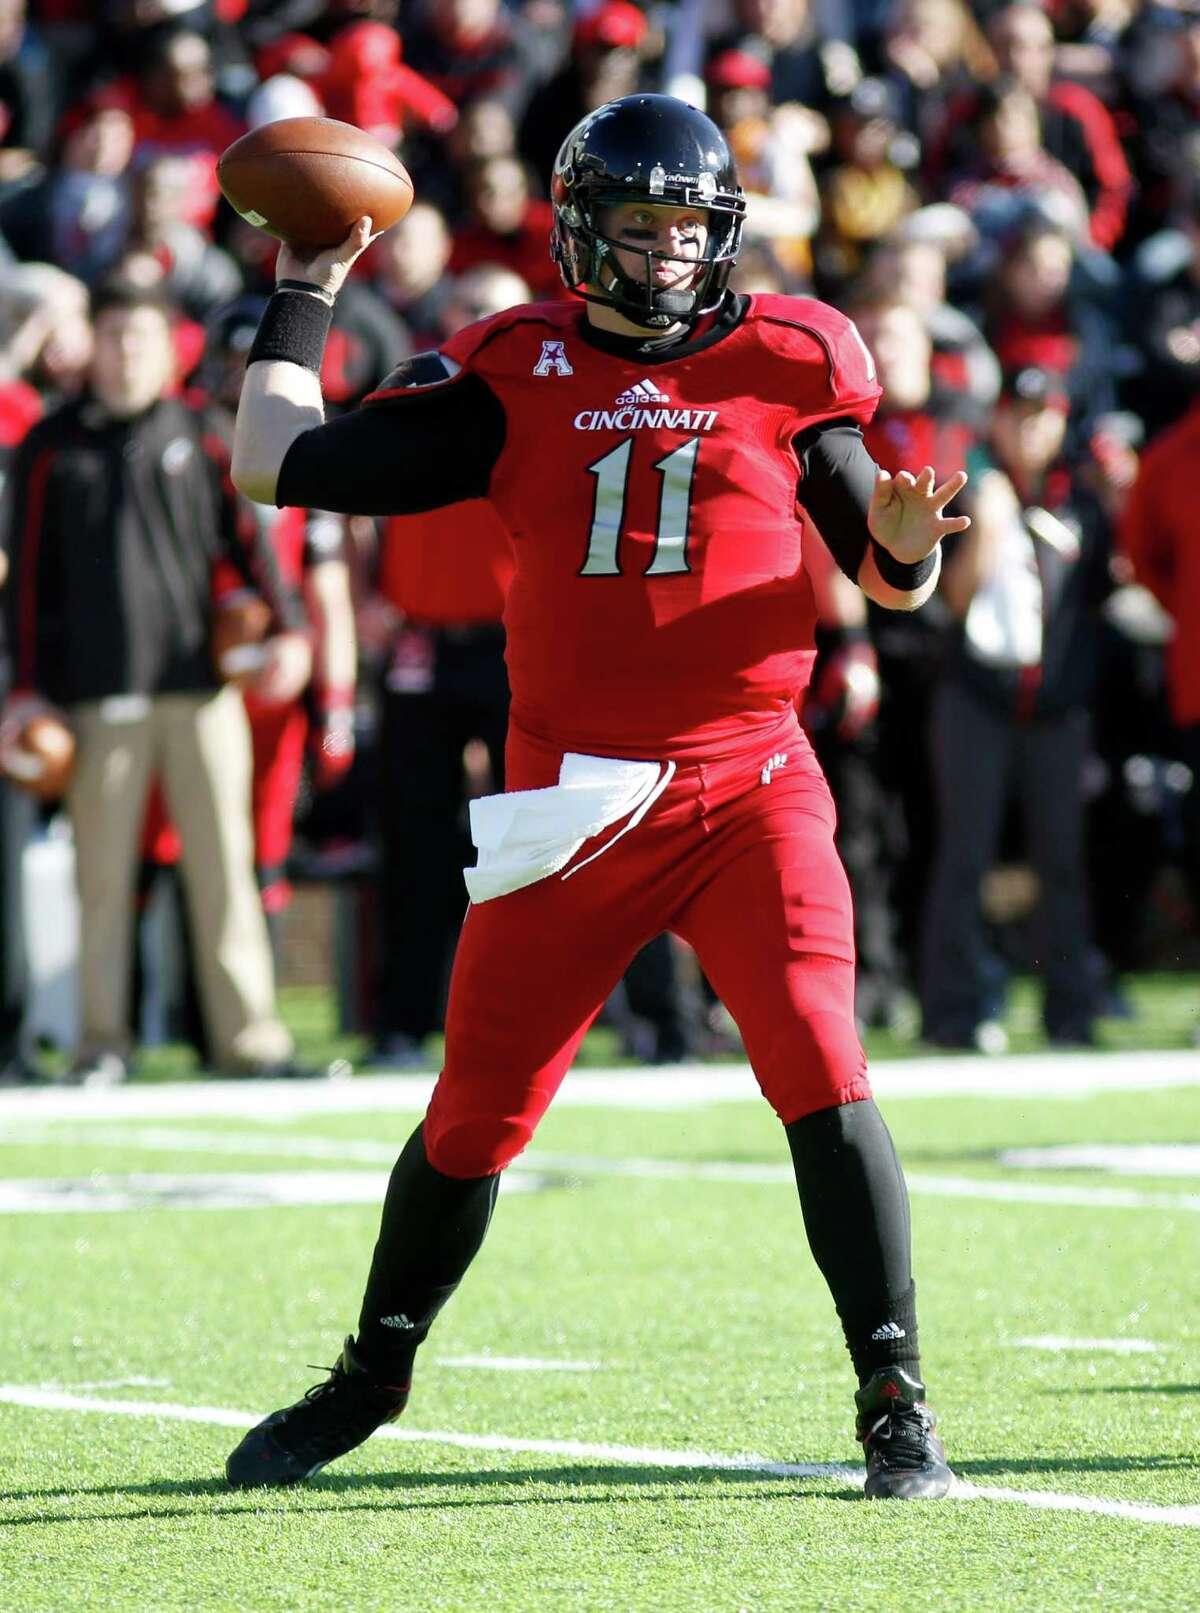 Cincinnati quarterback Brendon Kay throws against SMU during an NCAA college football game, Saturday, Nov. 9, 2013, in Cincinnati. (AP Photo/David Kohl)